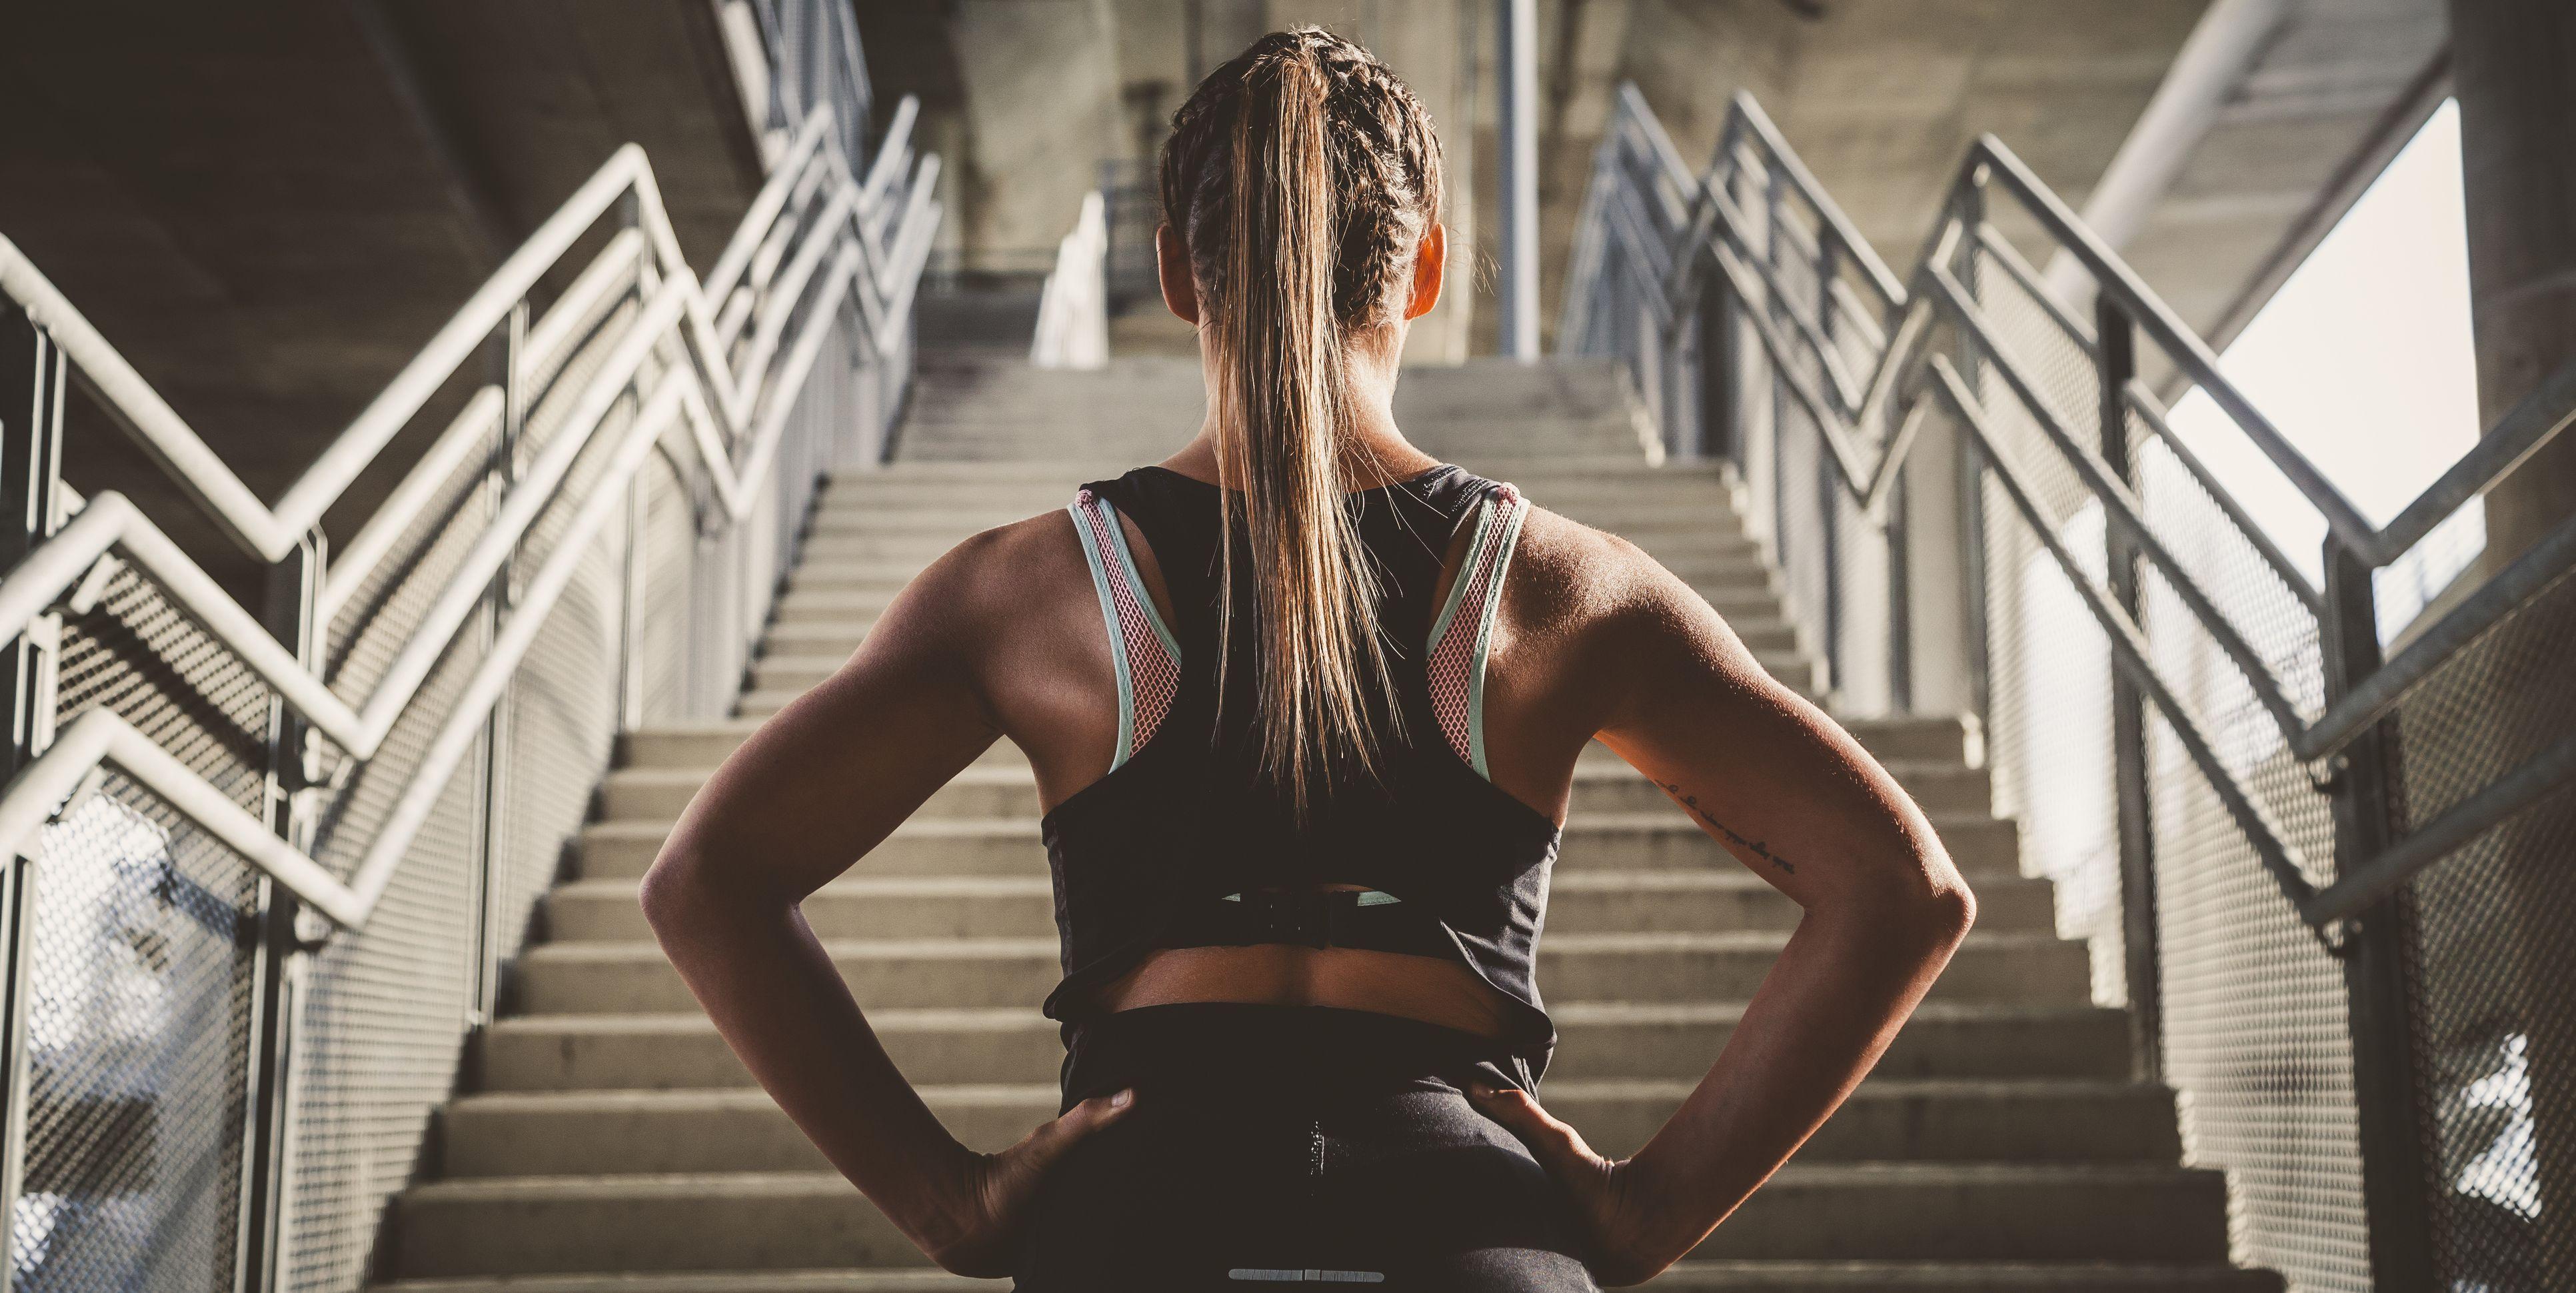 Girl prepairing for workout